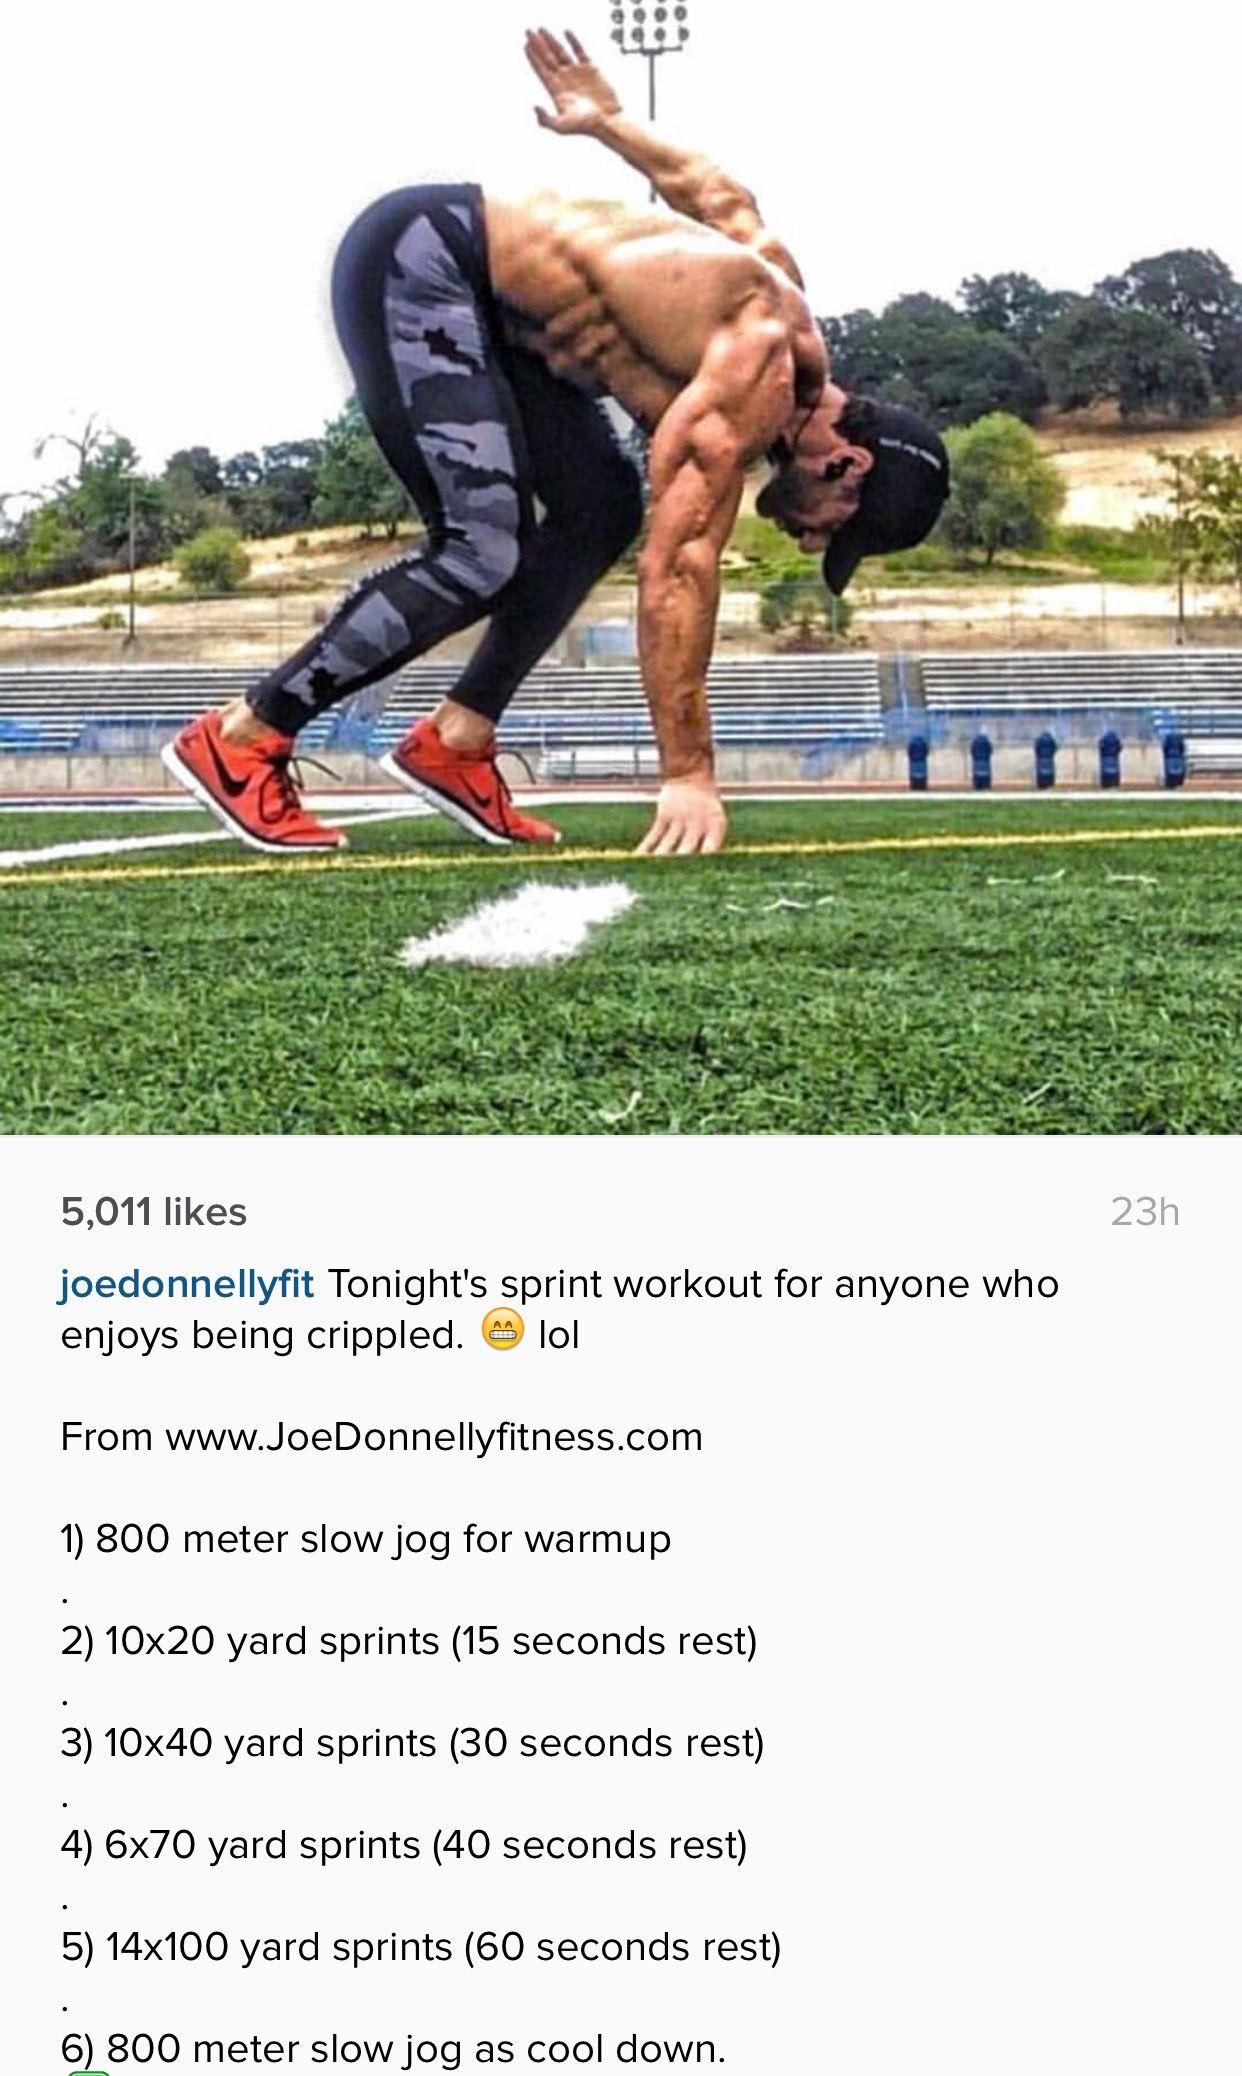 Joe Donnelly sprint workout   Fitness   Pinterest ...